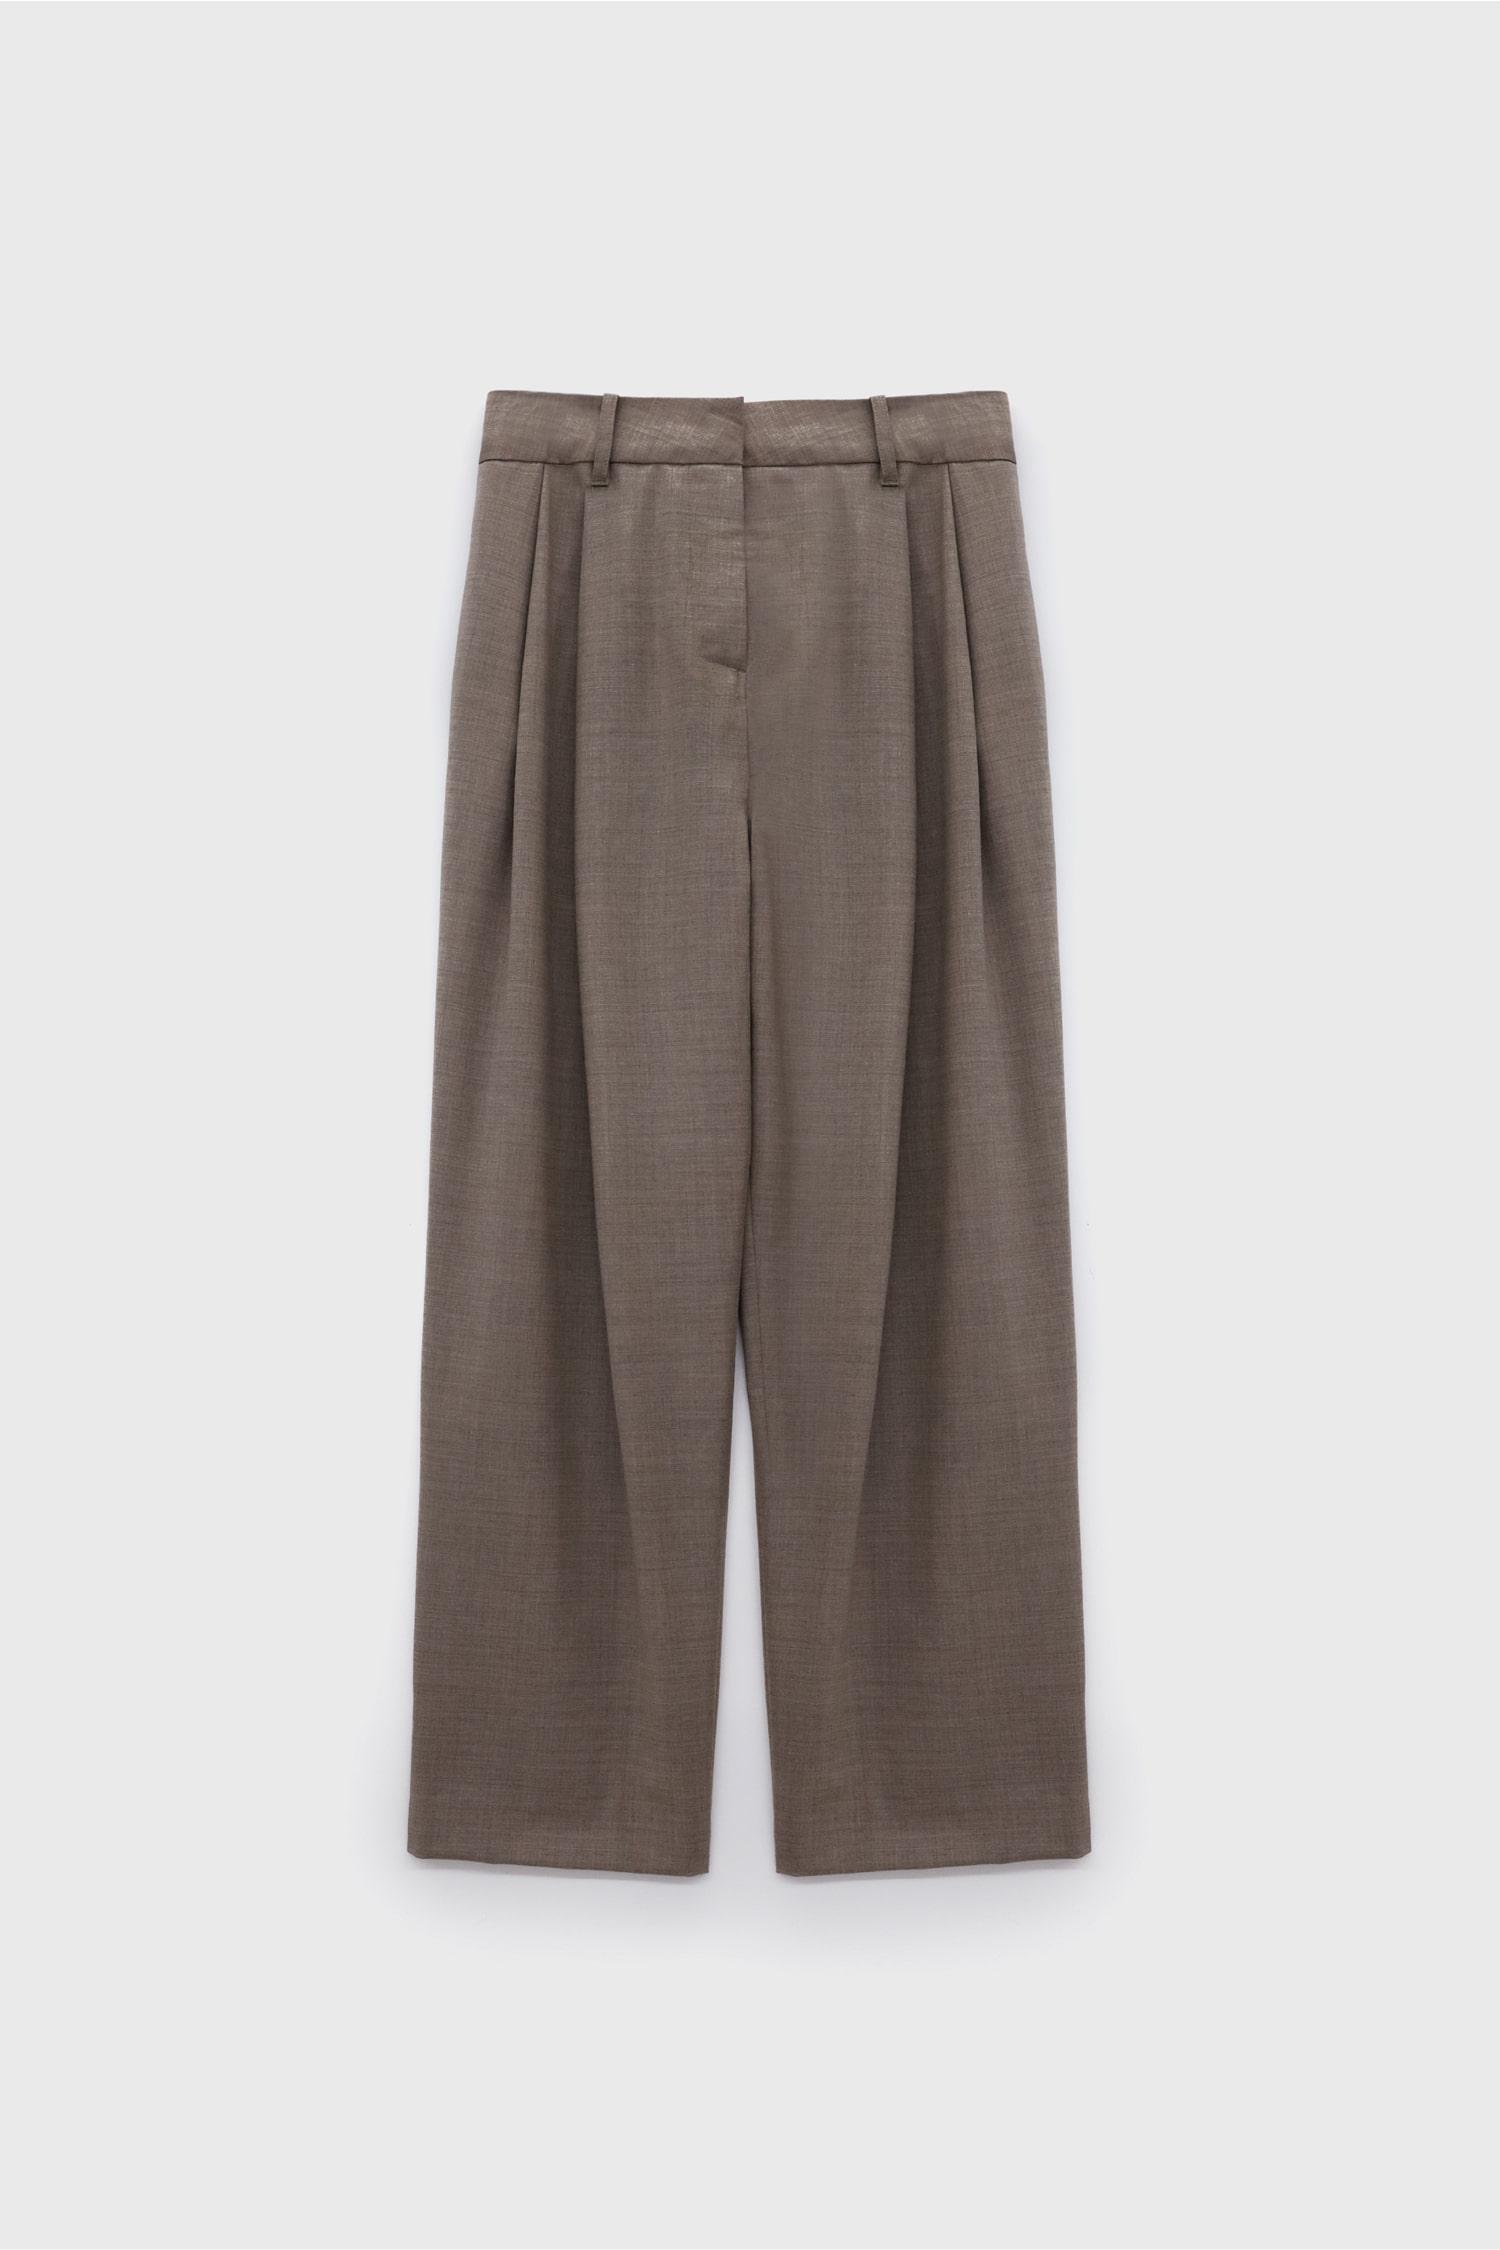 Two Pleats Pants